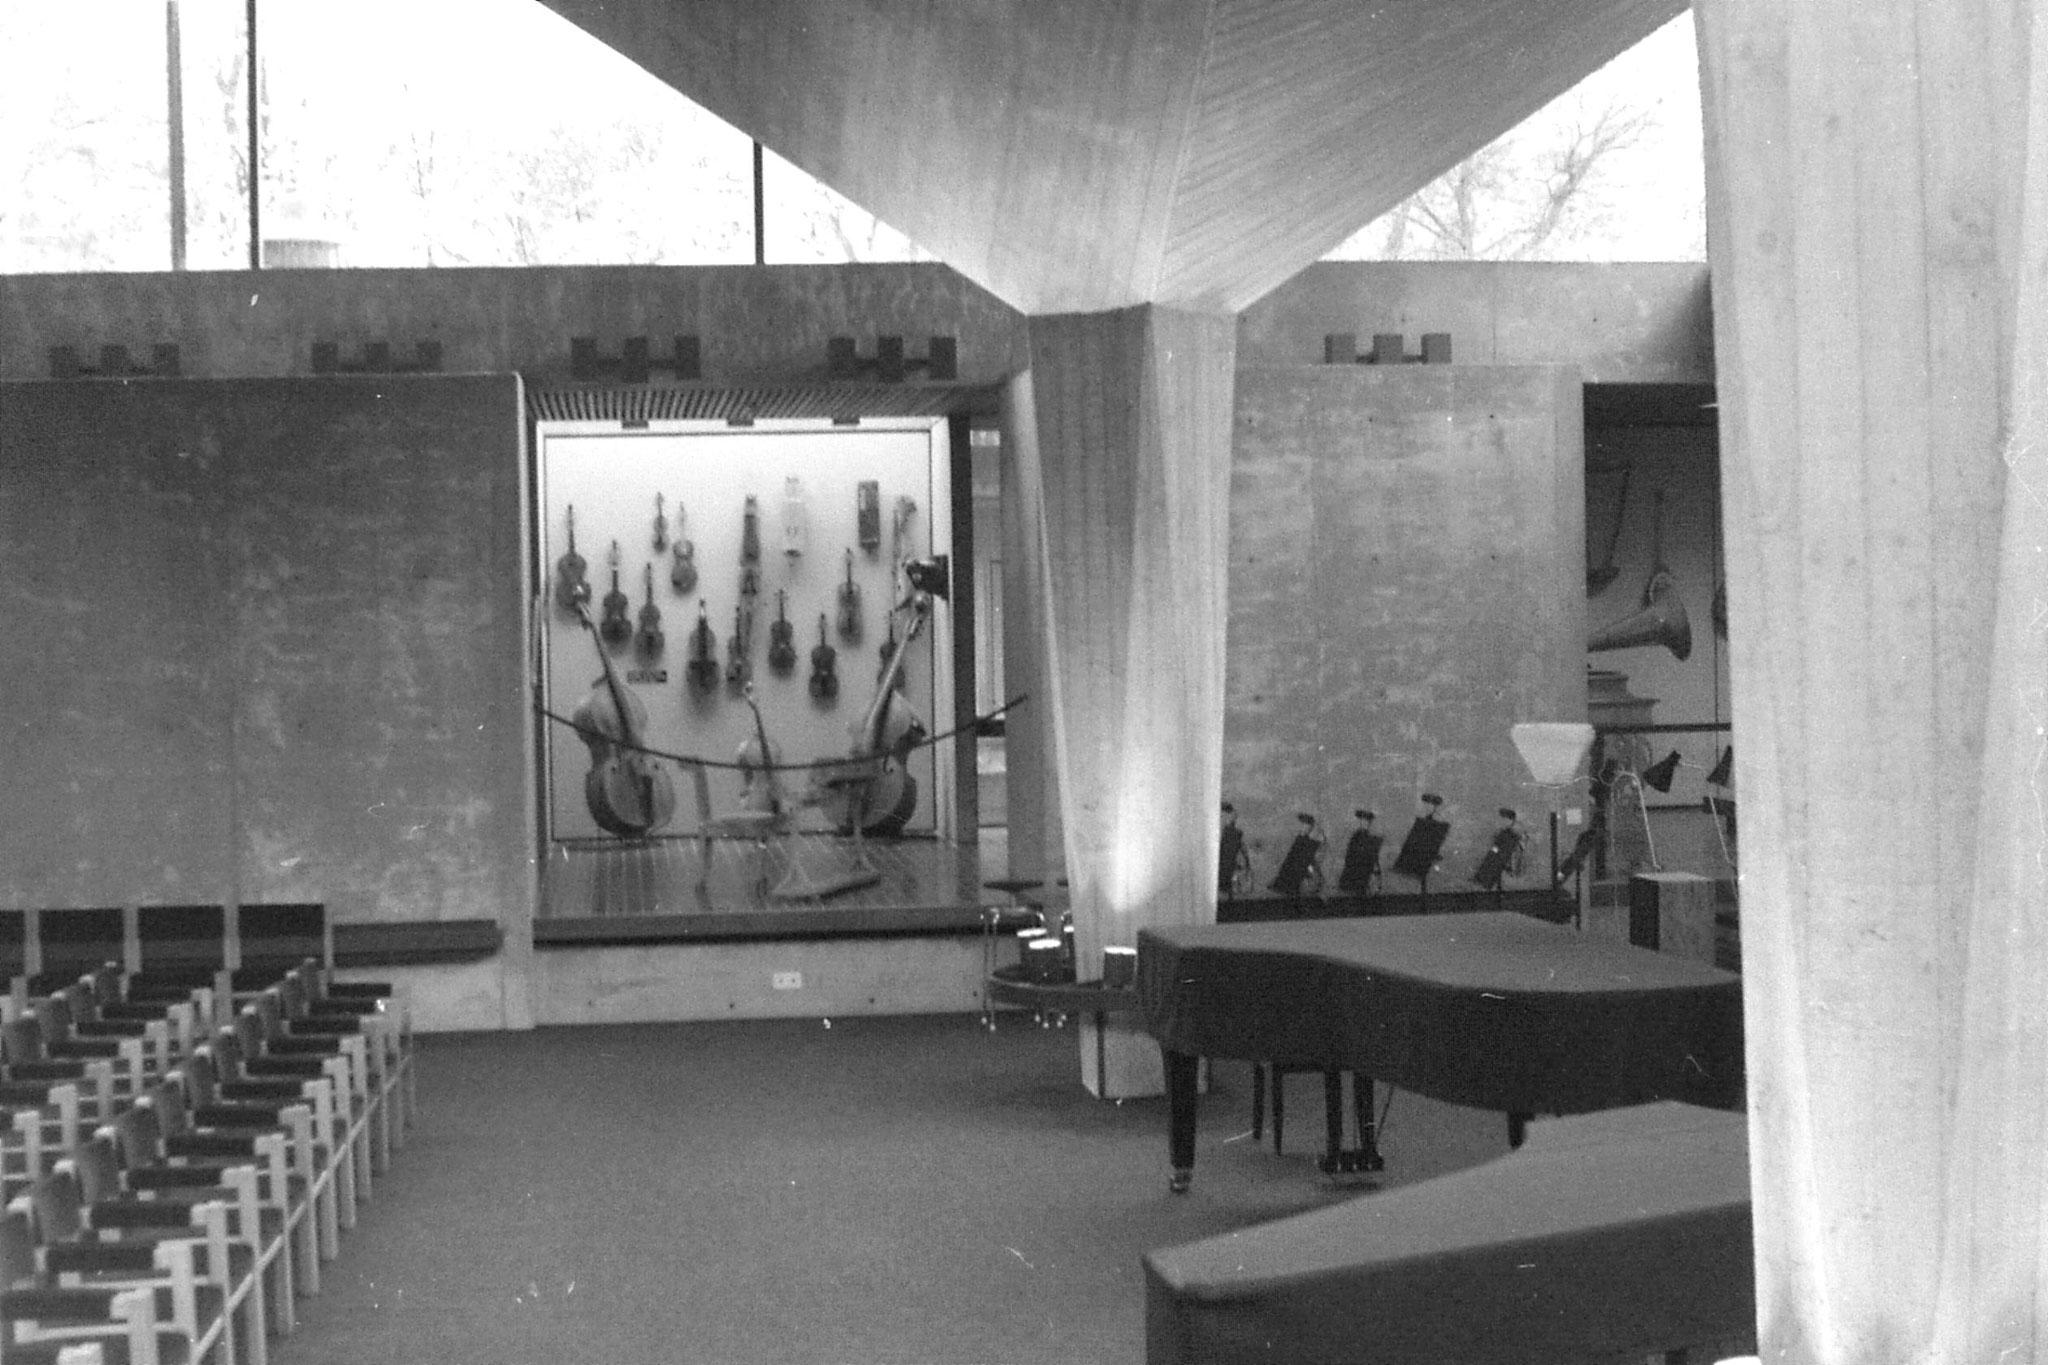 7/10/1988: 33: Sibelius museum, Turku